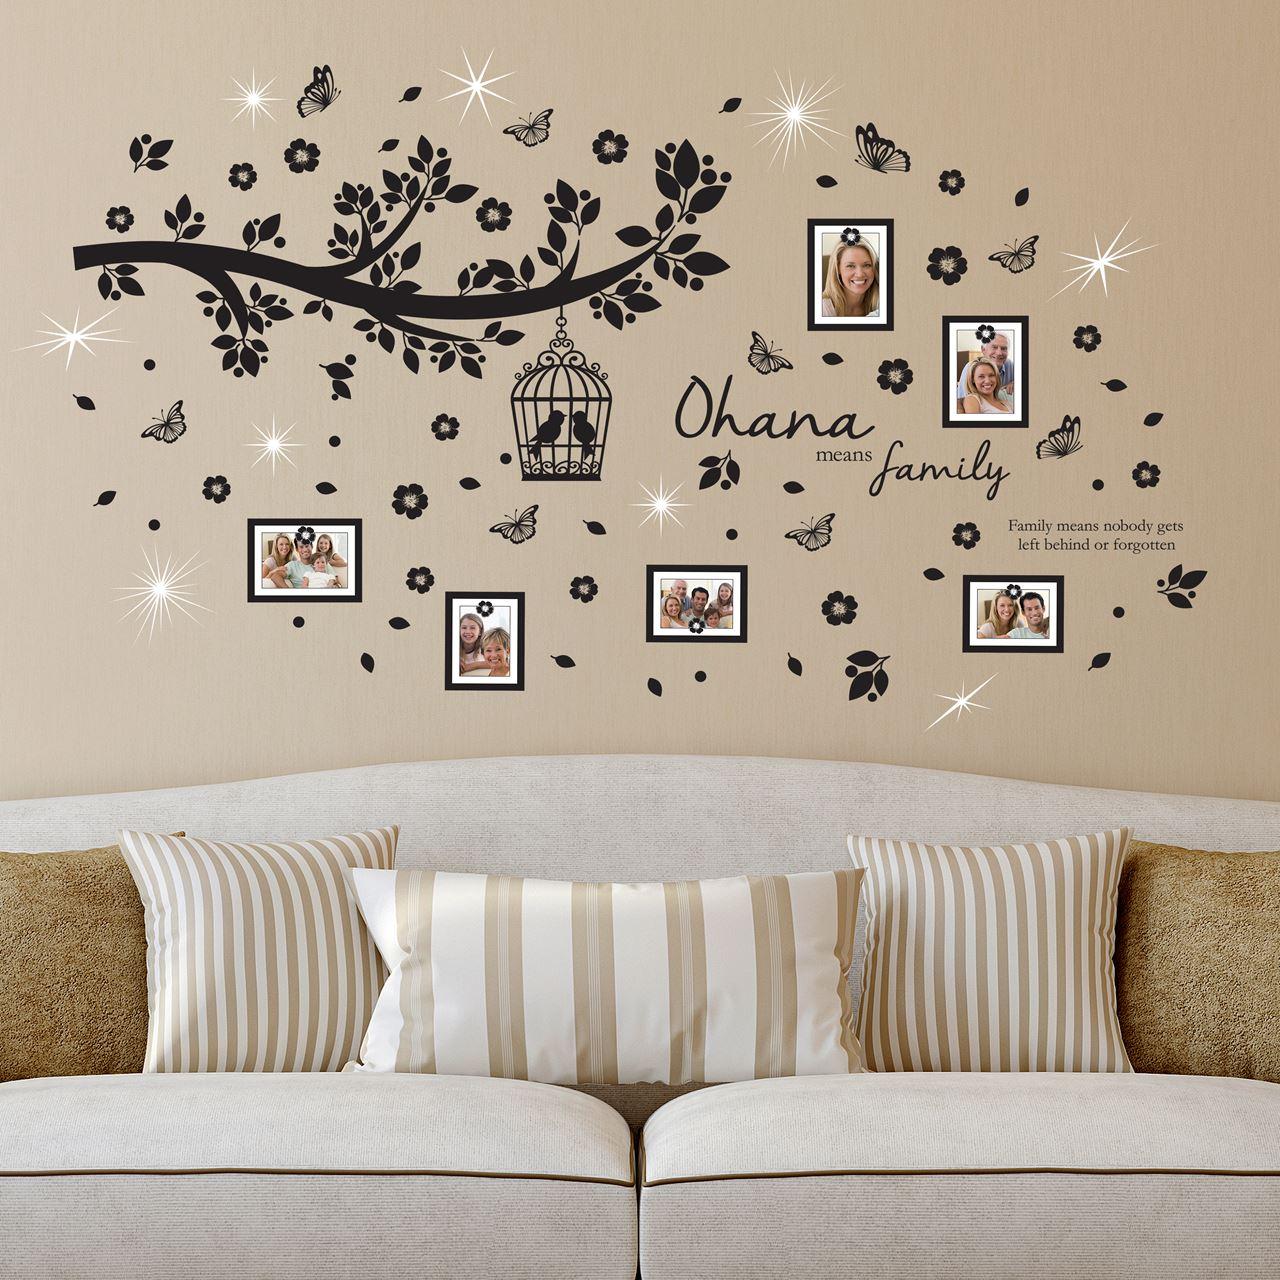 Channeldistribution walplus home decoratie sticker ohana familieboom foto frames met 9 - Home decoratie met tomettes ...